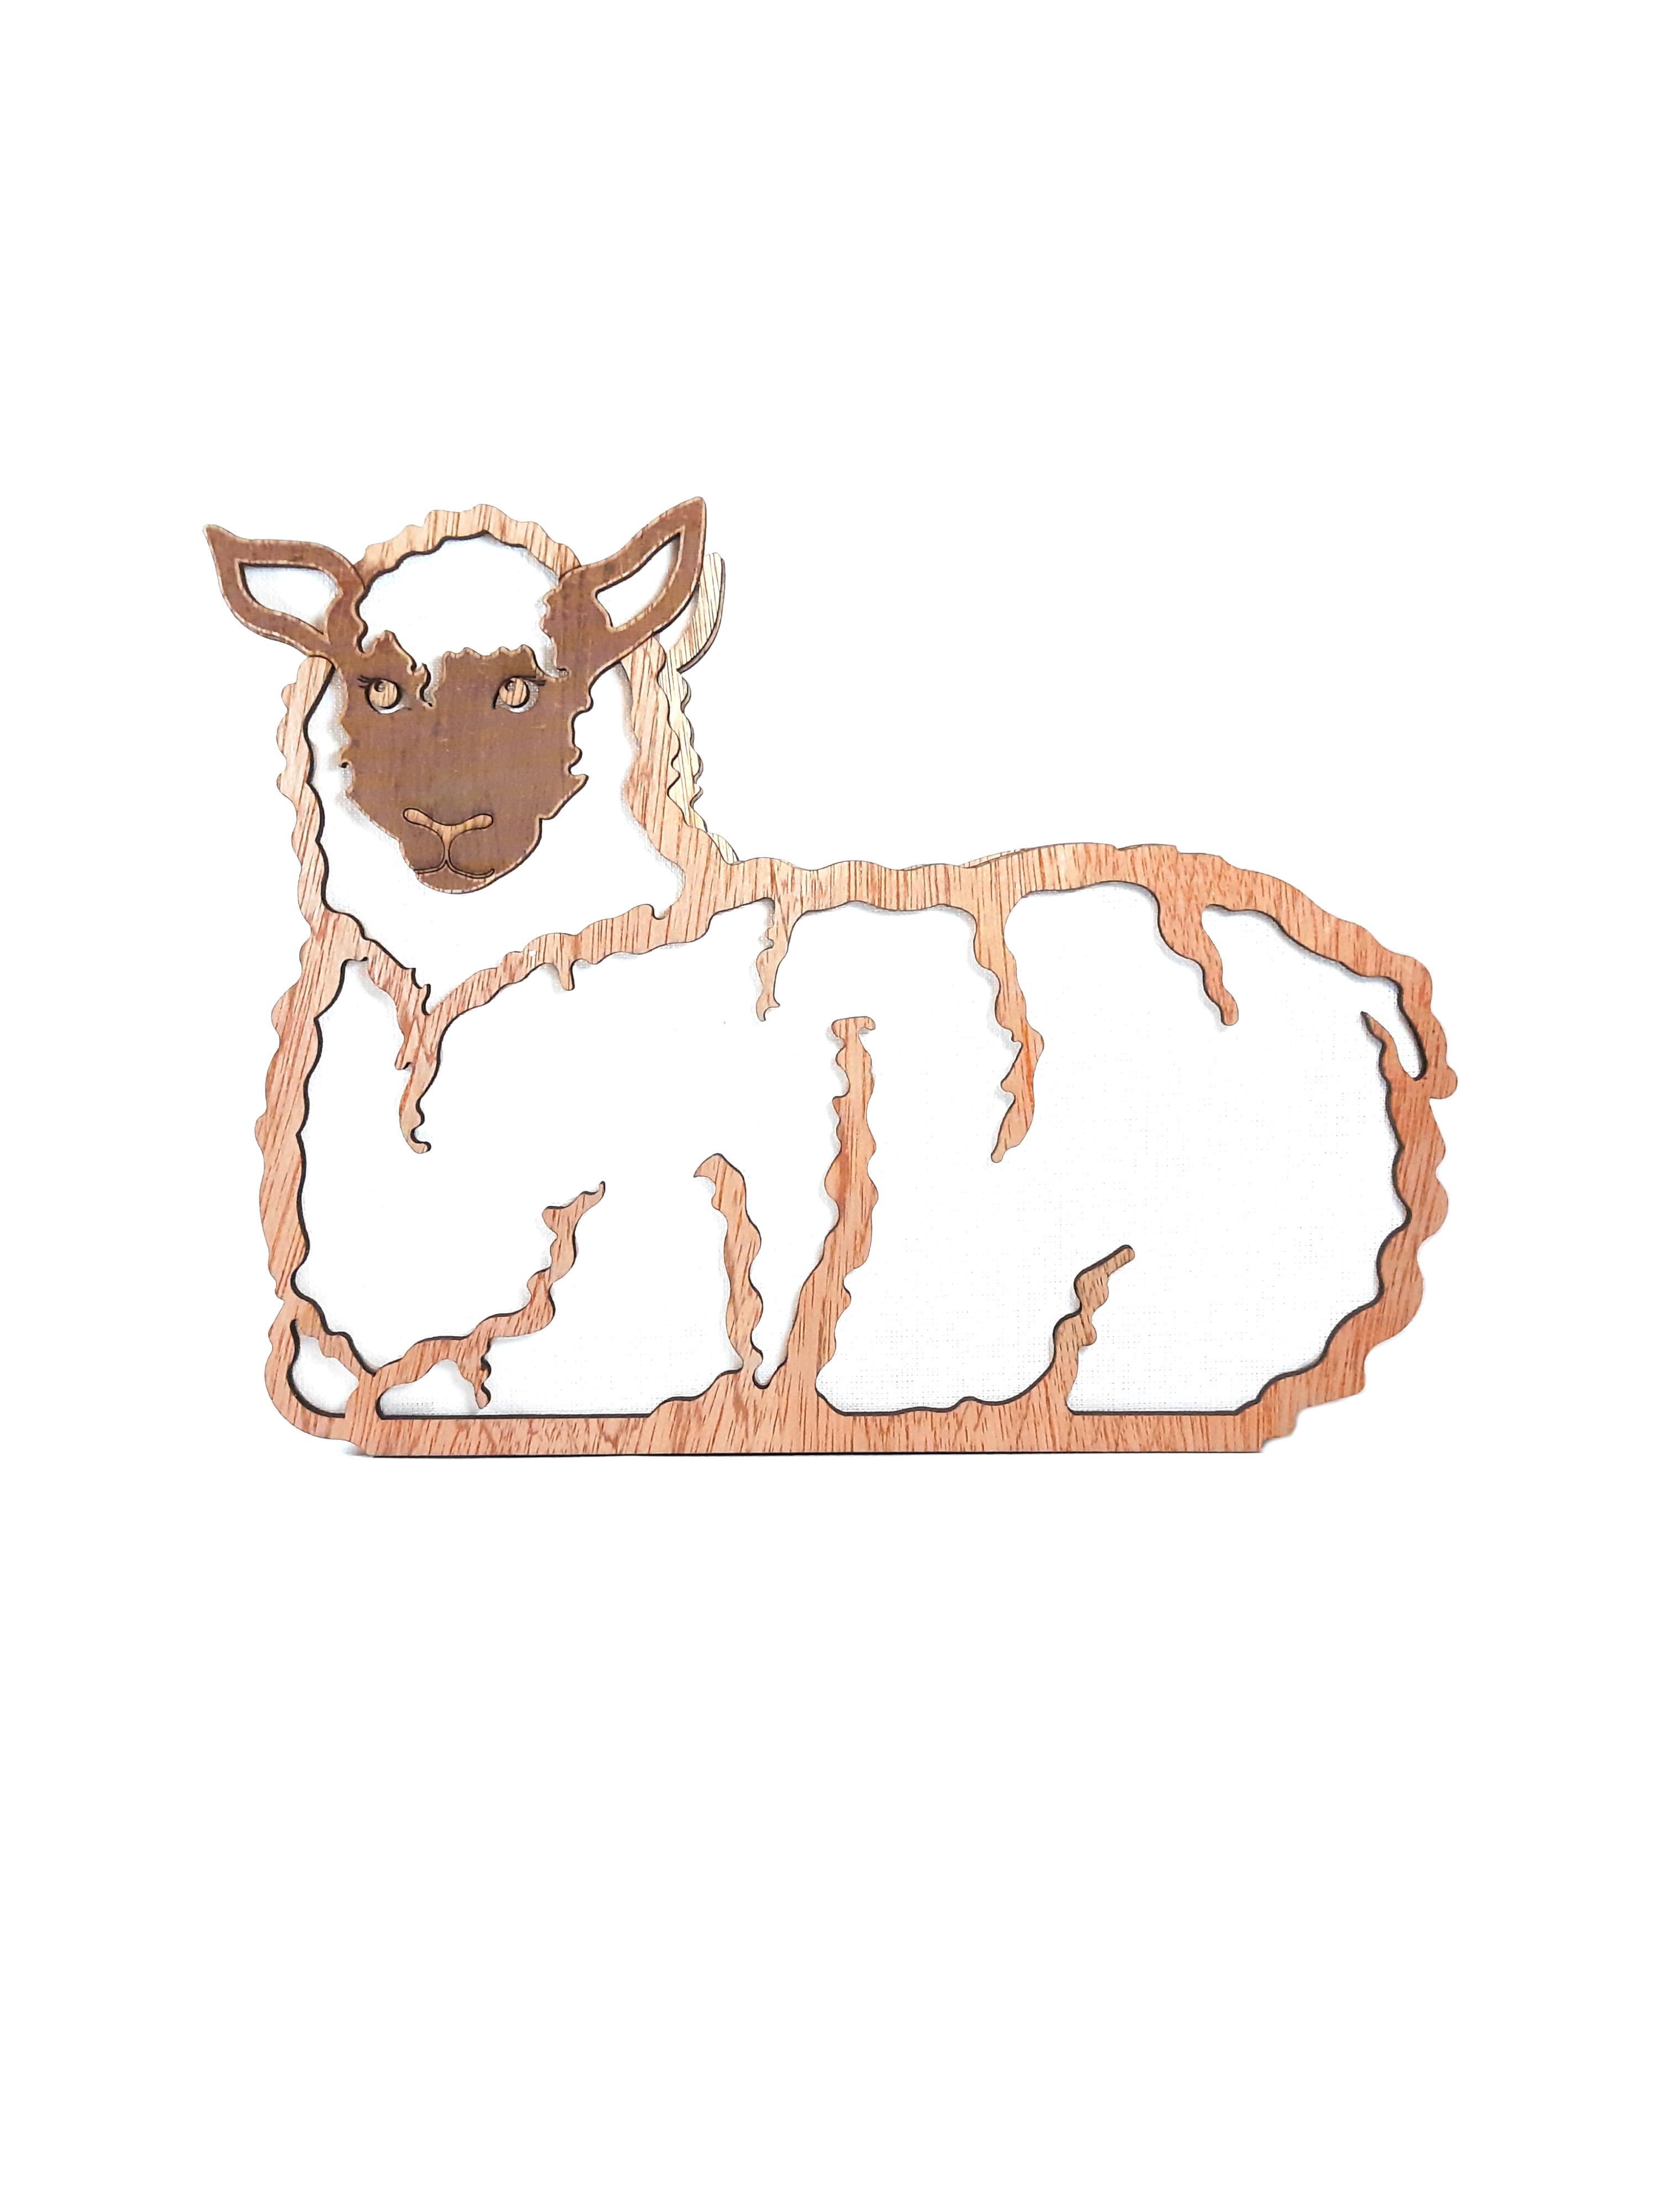 Llanwenog Sheep, Lamp